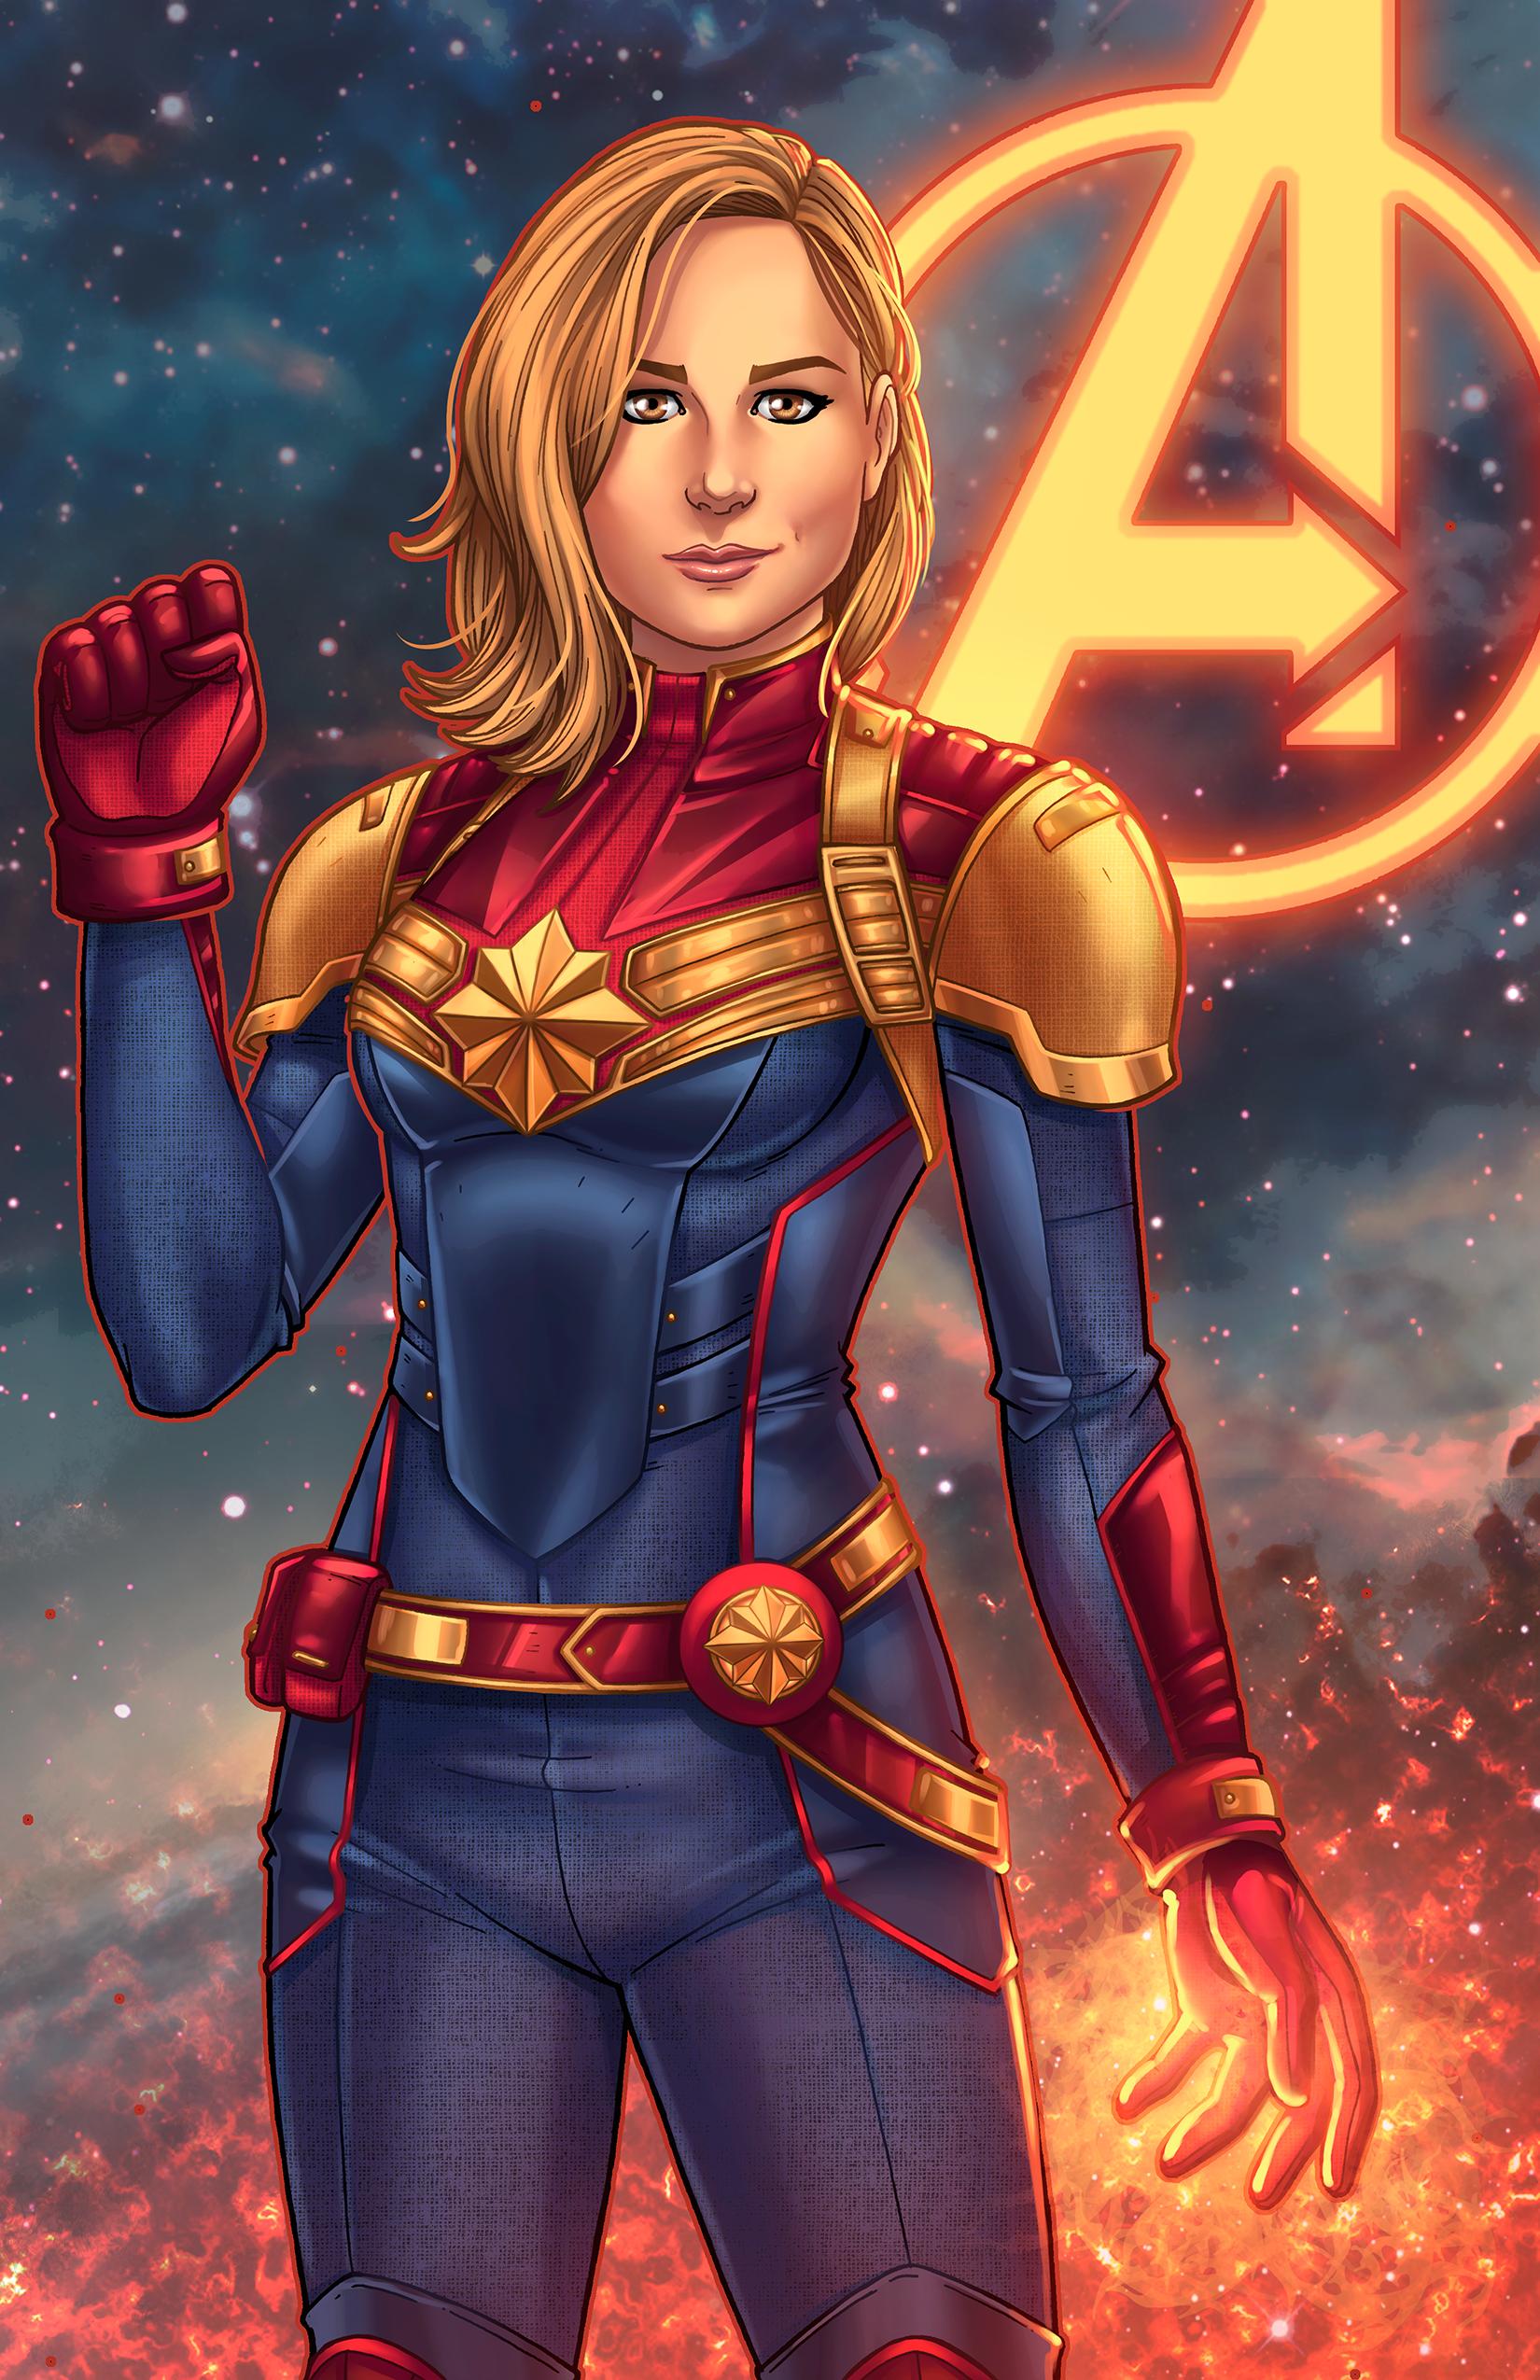 Comic Aun Book Cover Illustration Ver ~ Mcu captain marvel concept art by